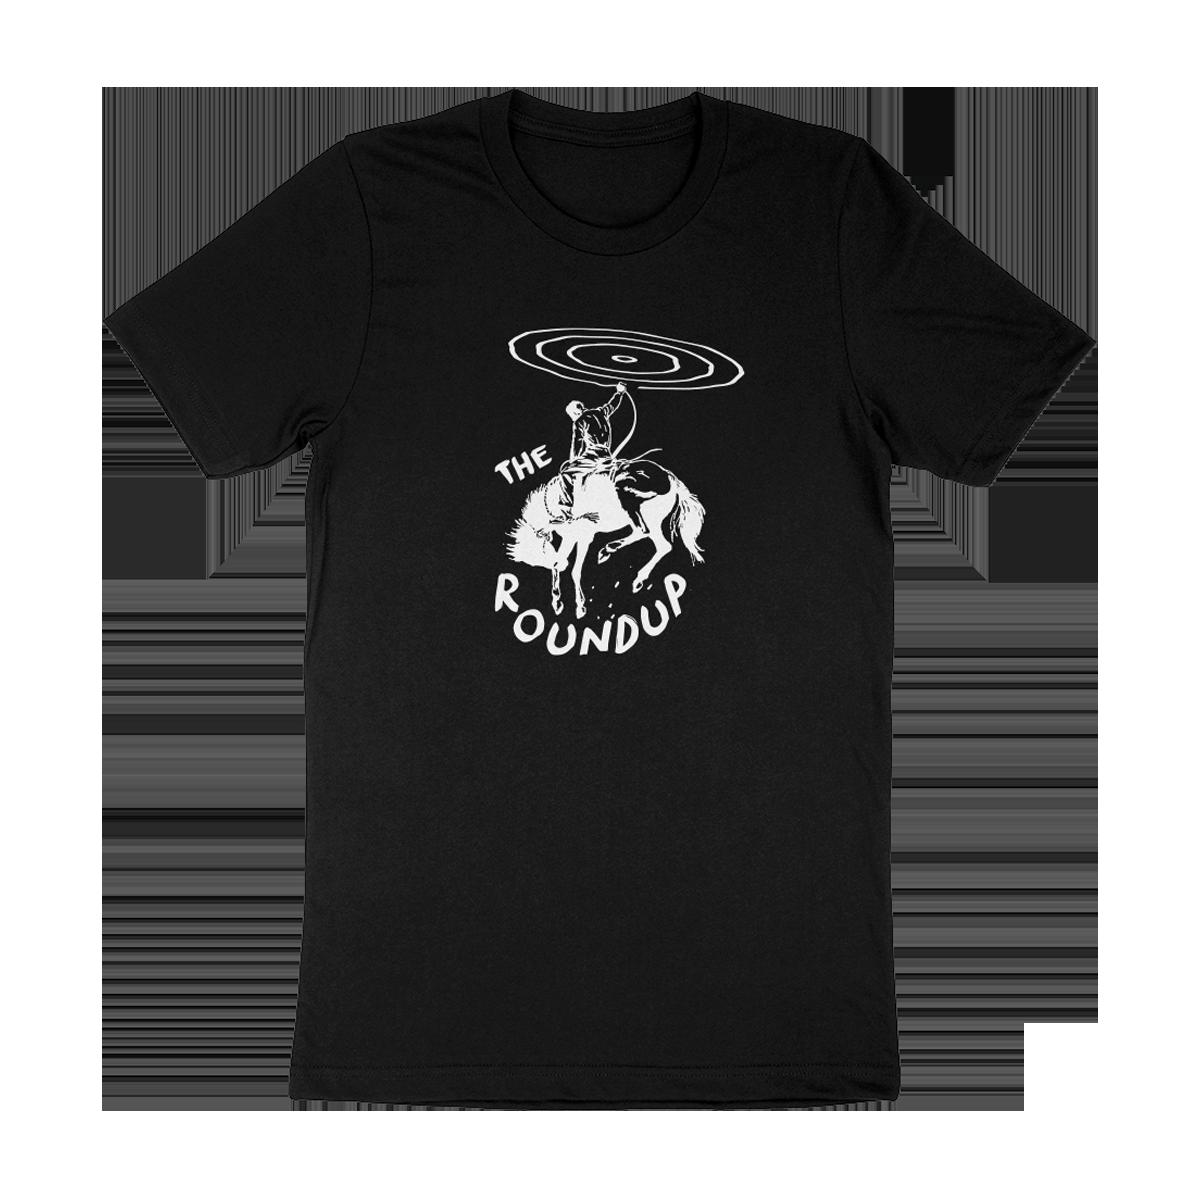 """The Roundup"" Rounder Records black tee shirt (unisex)"